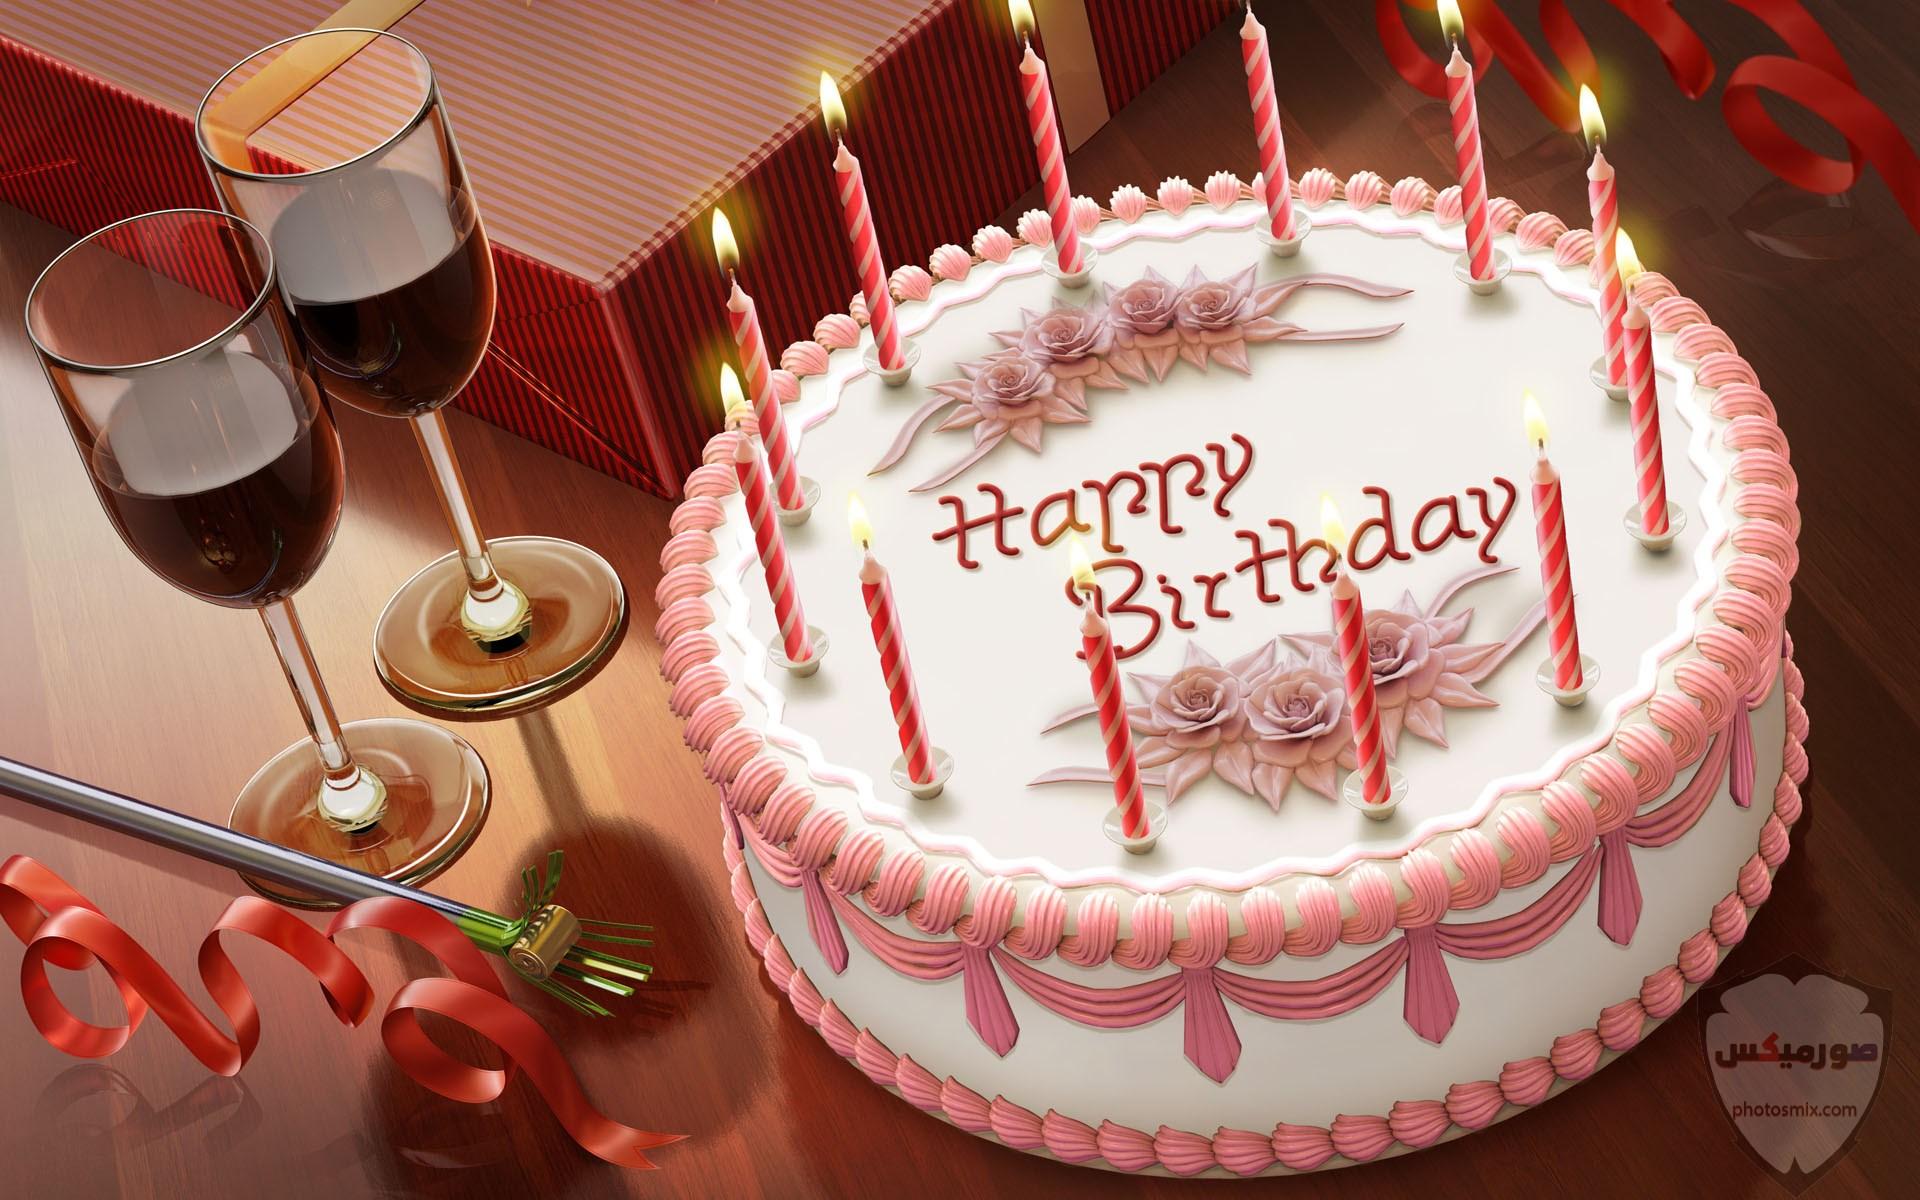 صور مكتوب عليها عيد ميلاد سعيد 16